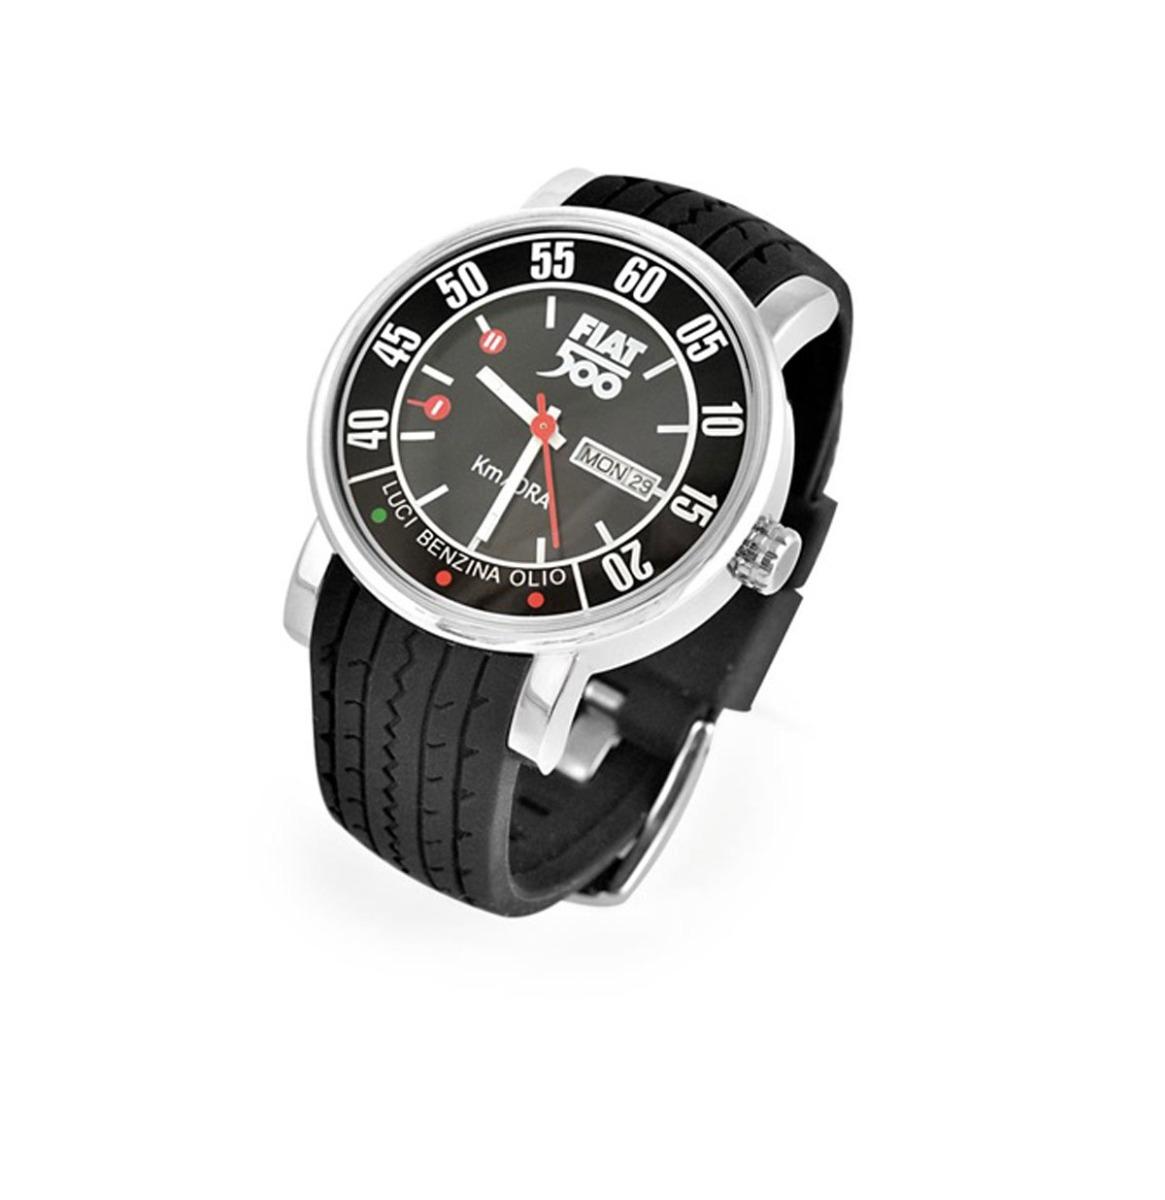 Fiat 500 Pols Horloge Met Silycon Band Zwart